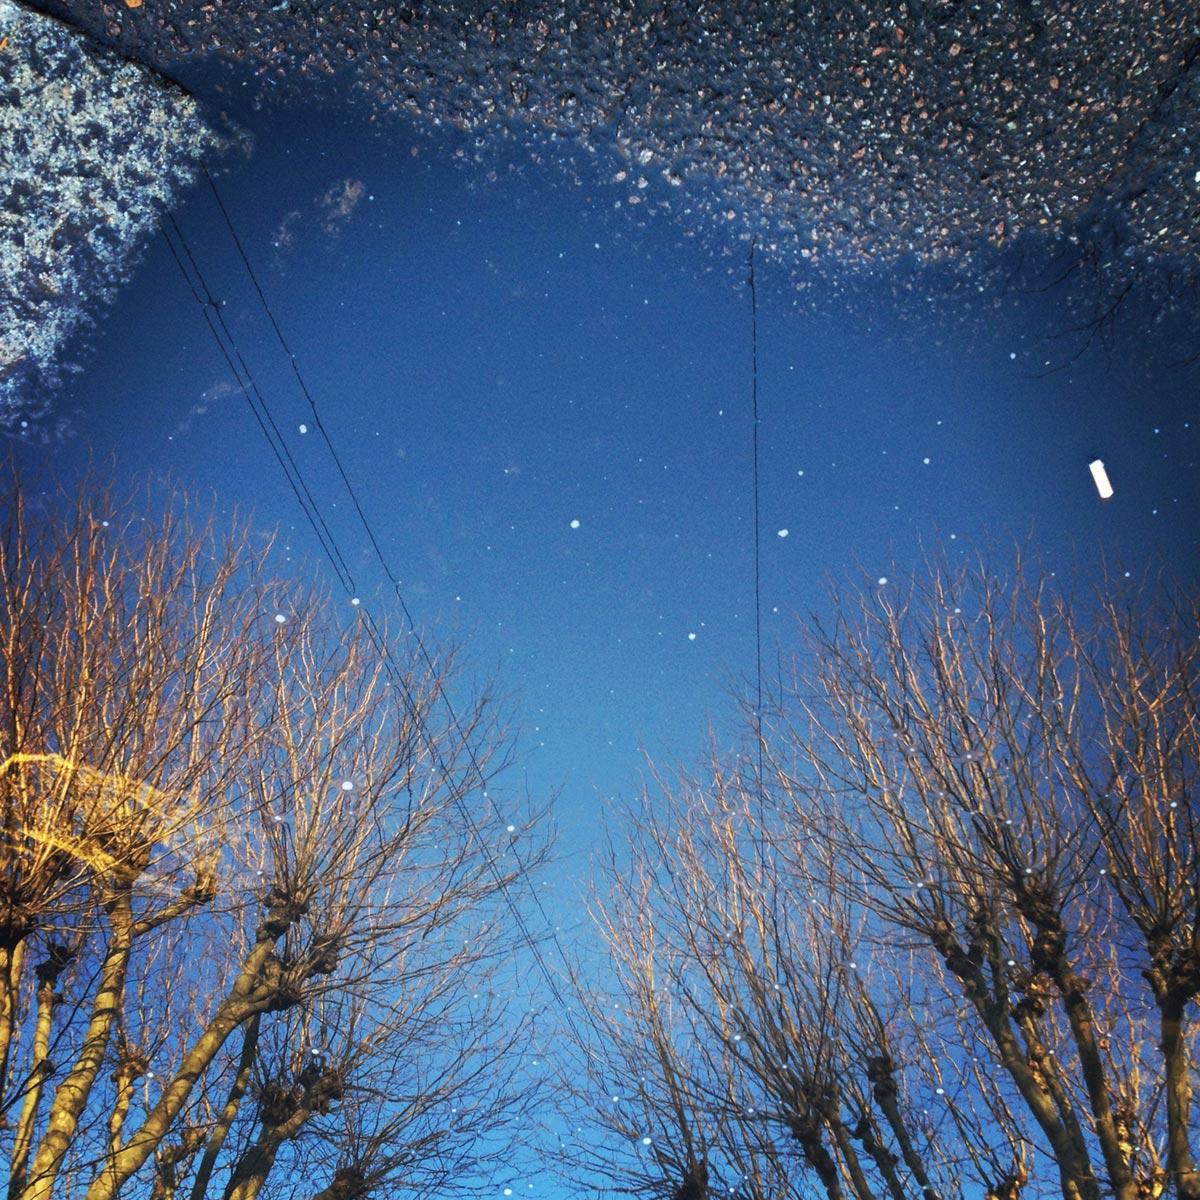 Walthamstow puddle reflection